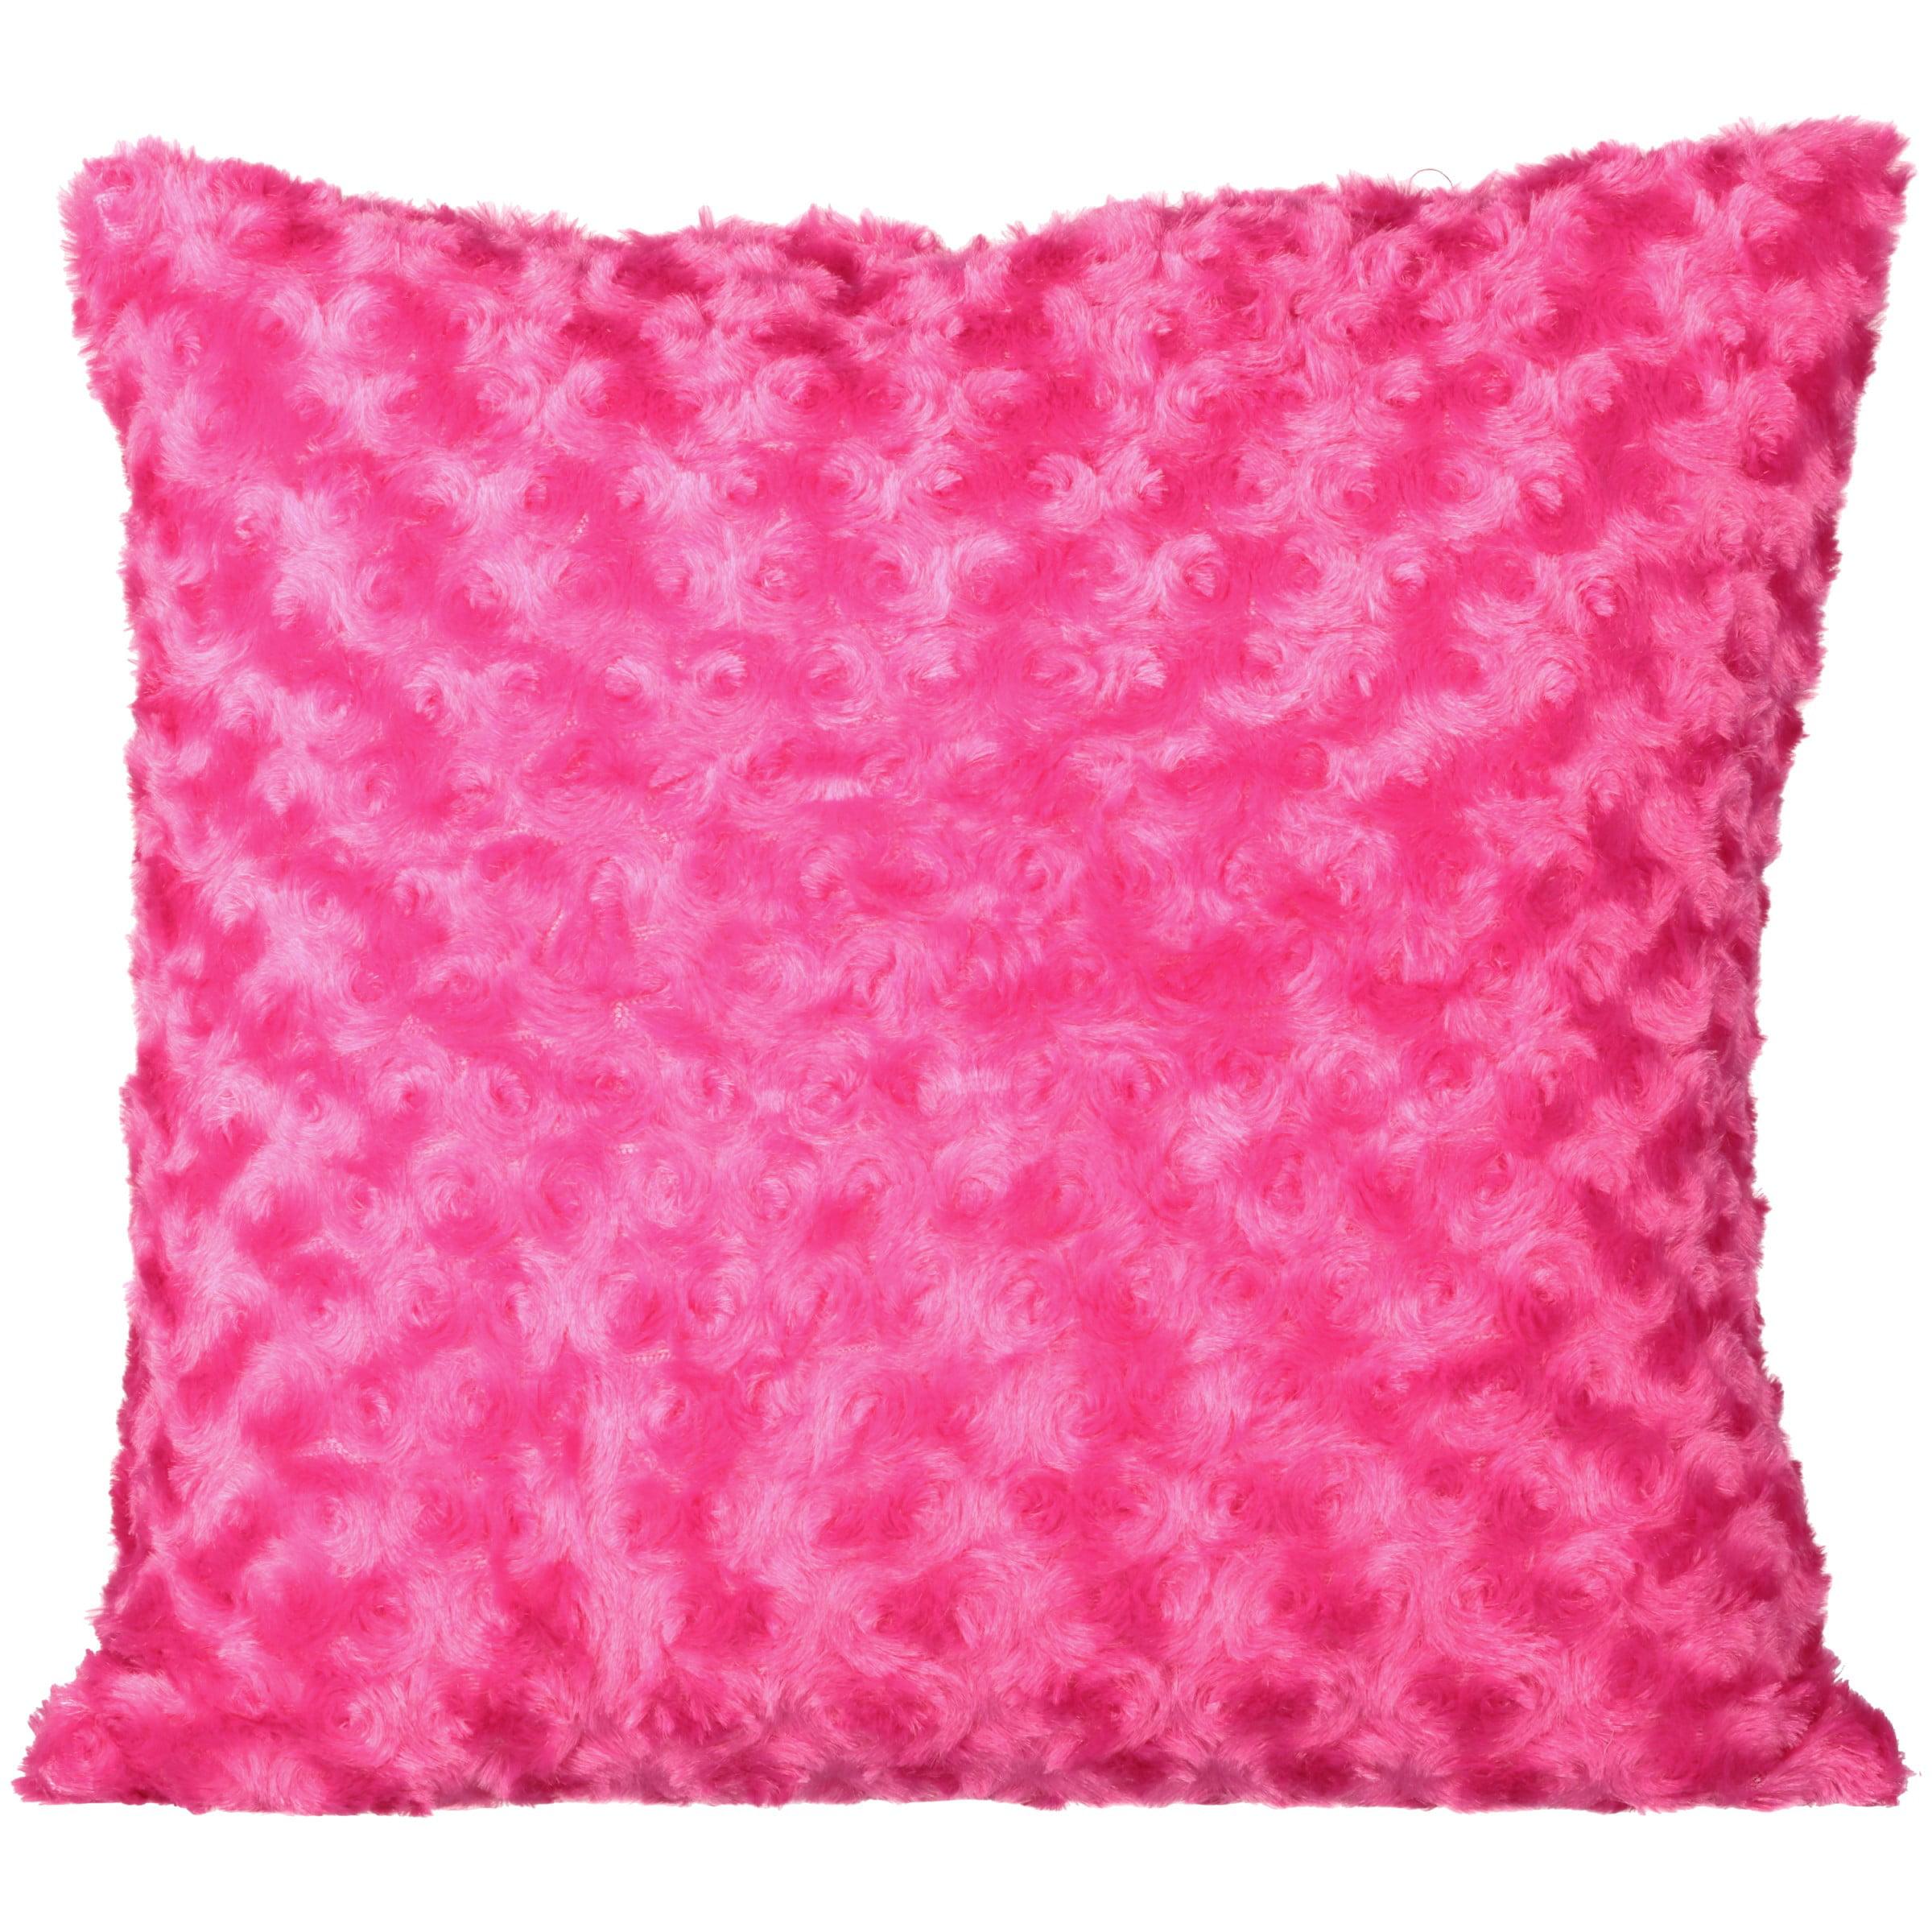 Your Zone Rosette Purple Pillow, 1 Each